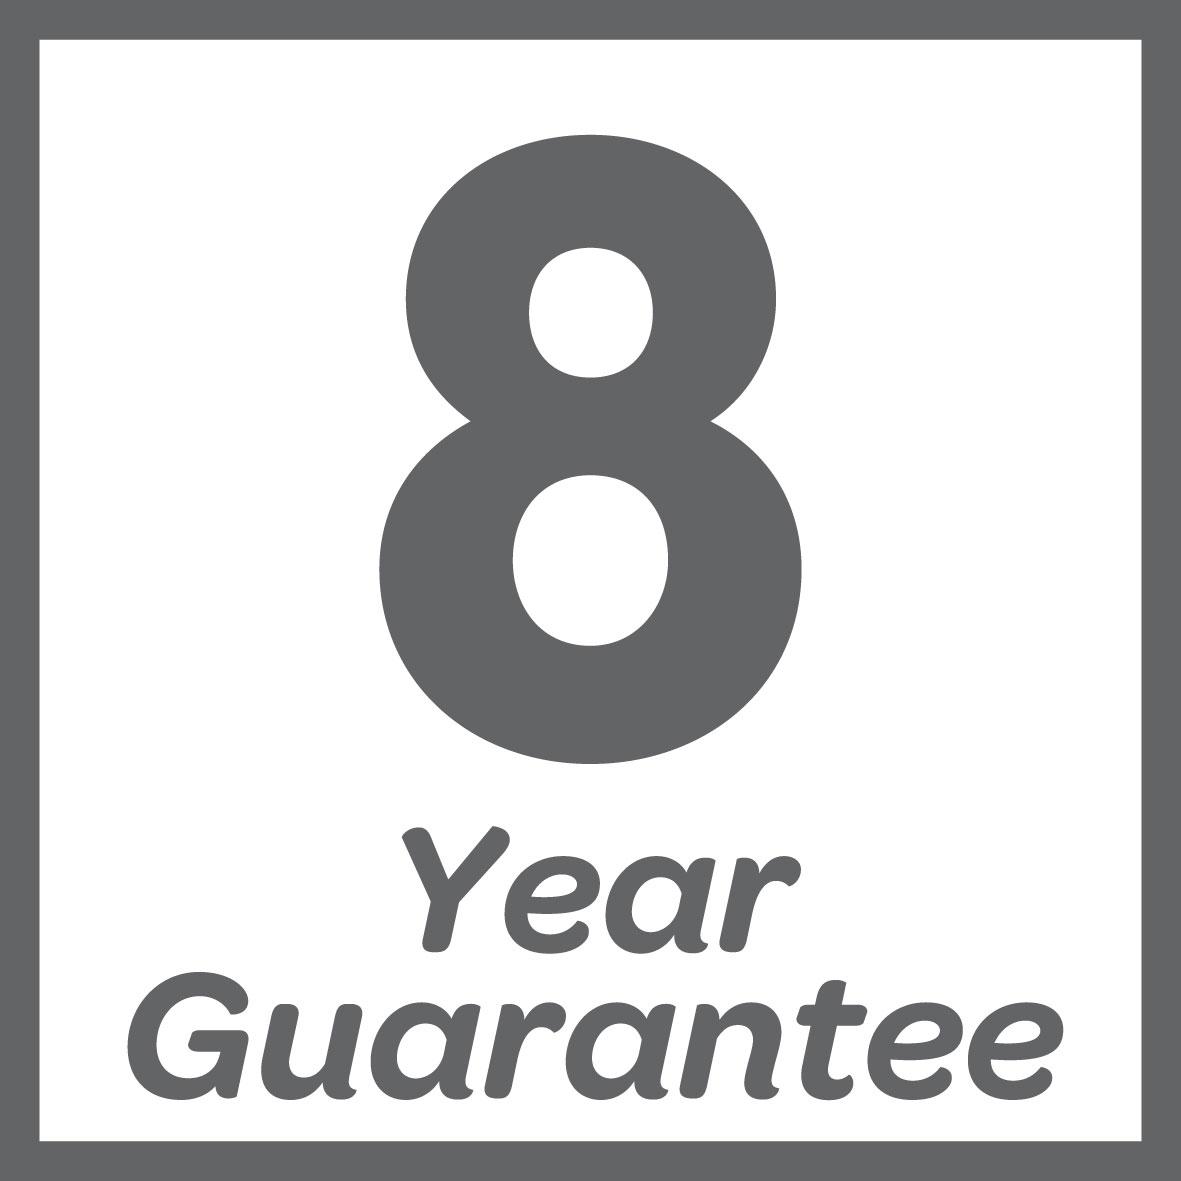 Guaranteed for 8 years